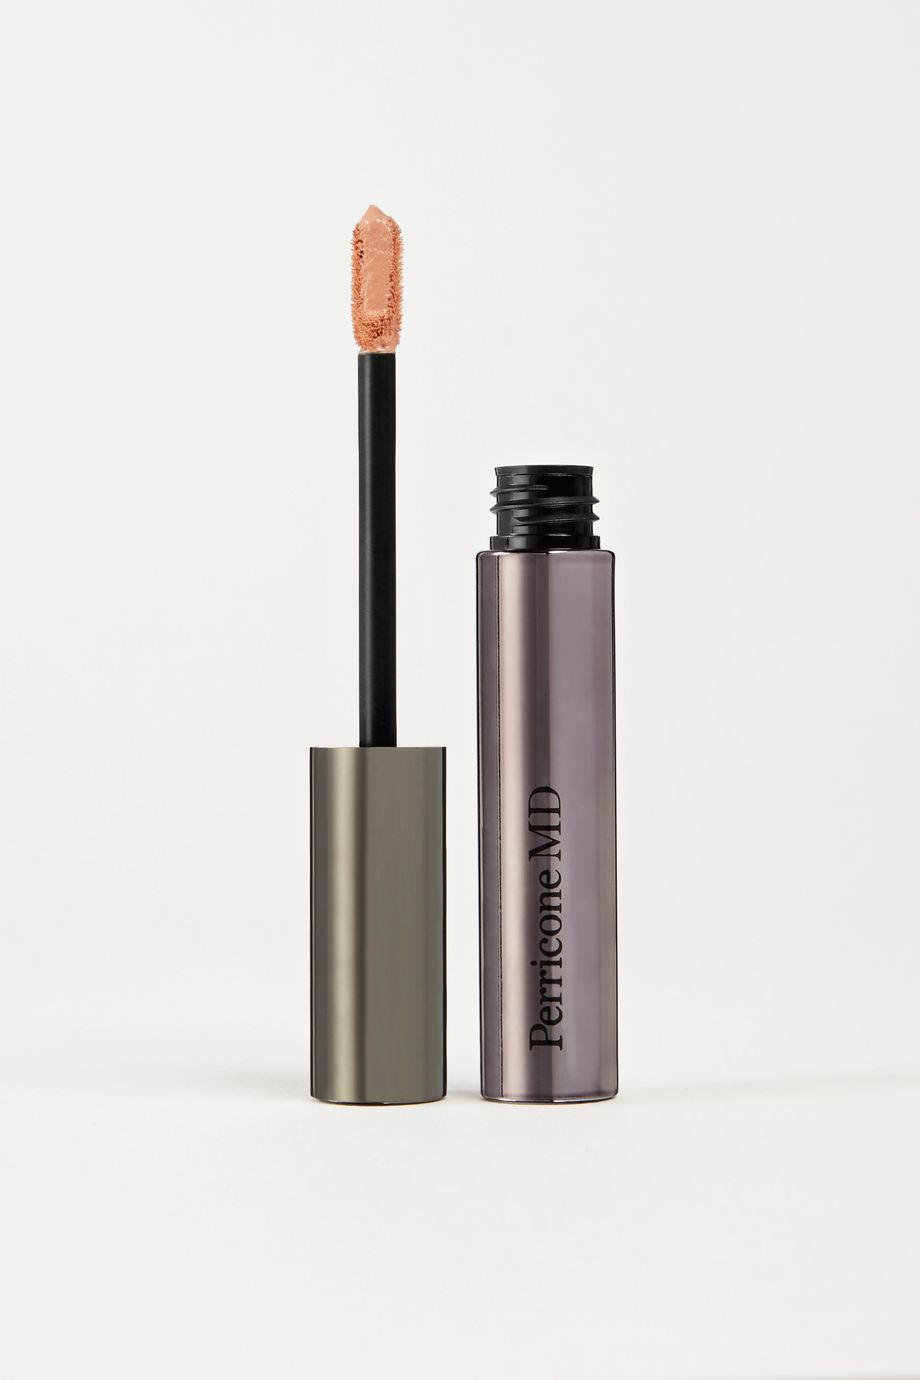 Perricone MD No Makeup Concealer Broad Spectrum SPF20 - Medium, 10ml